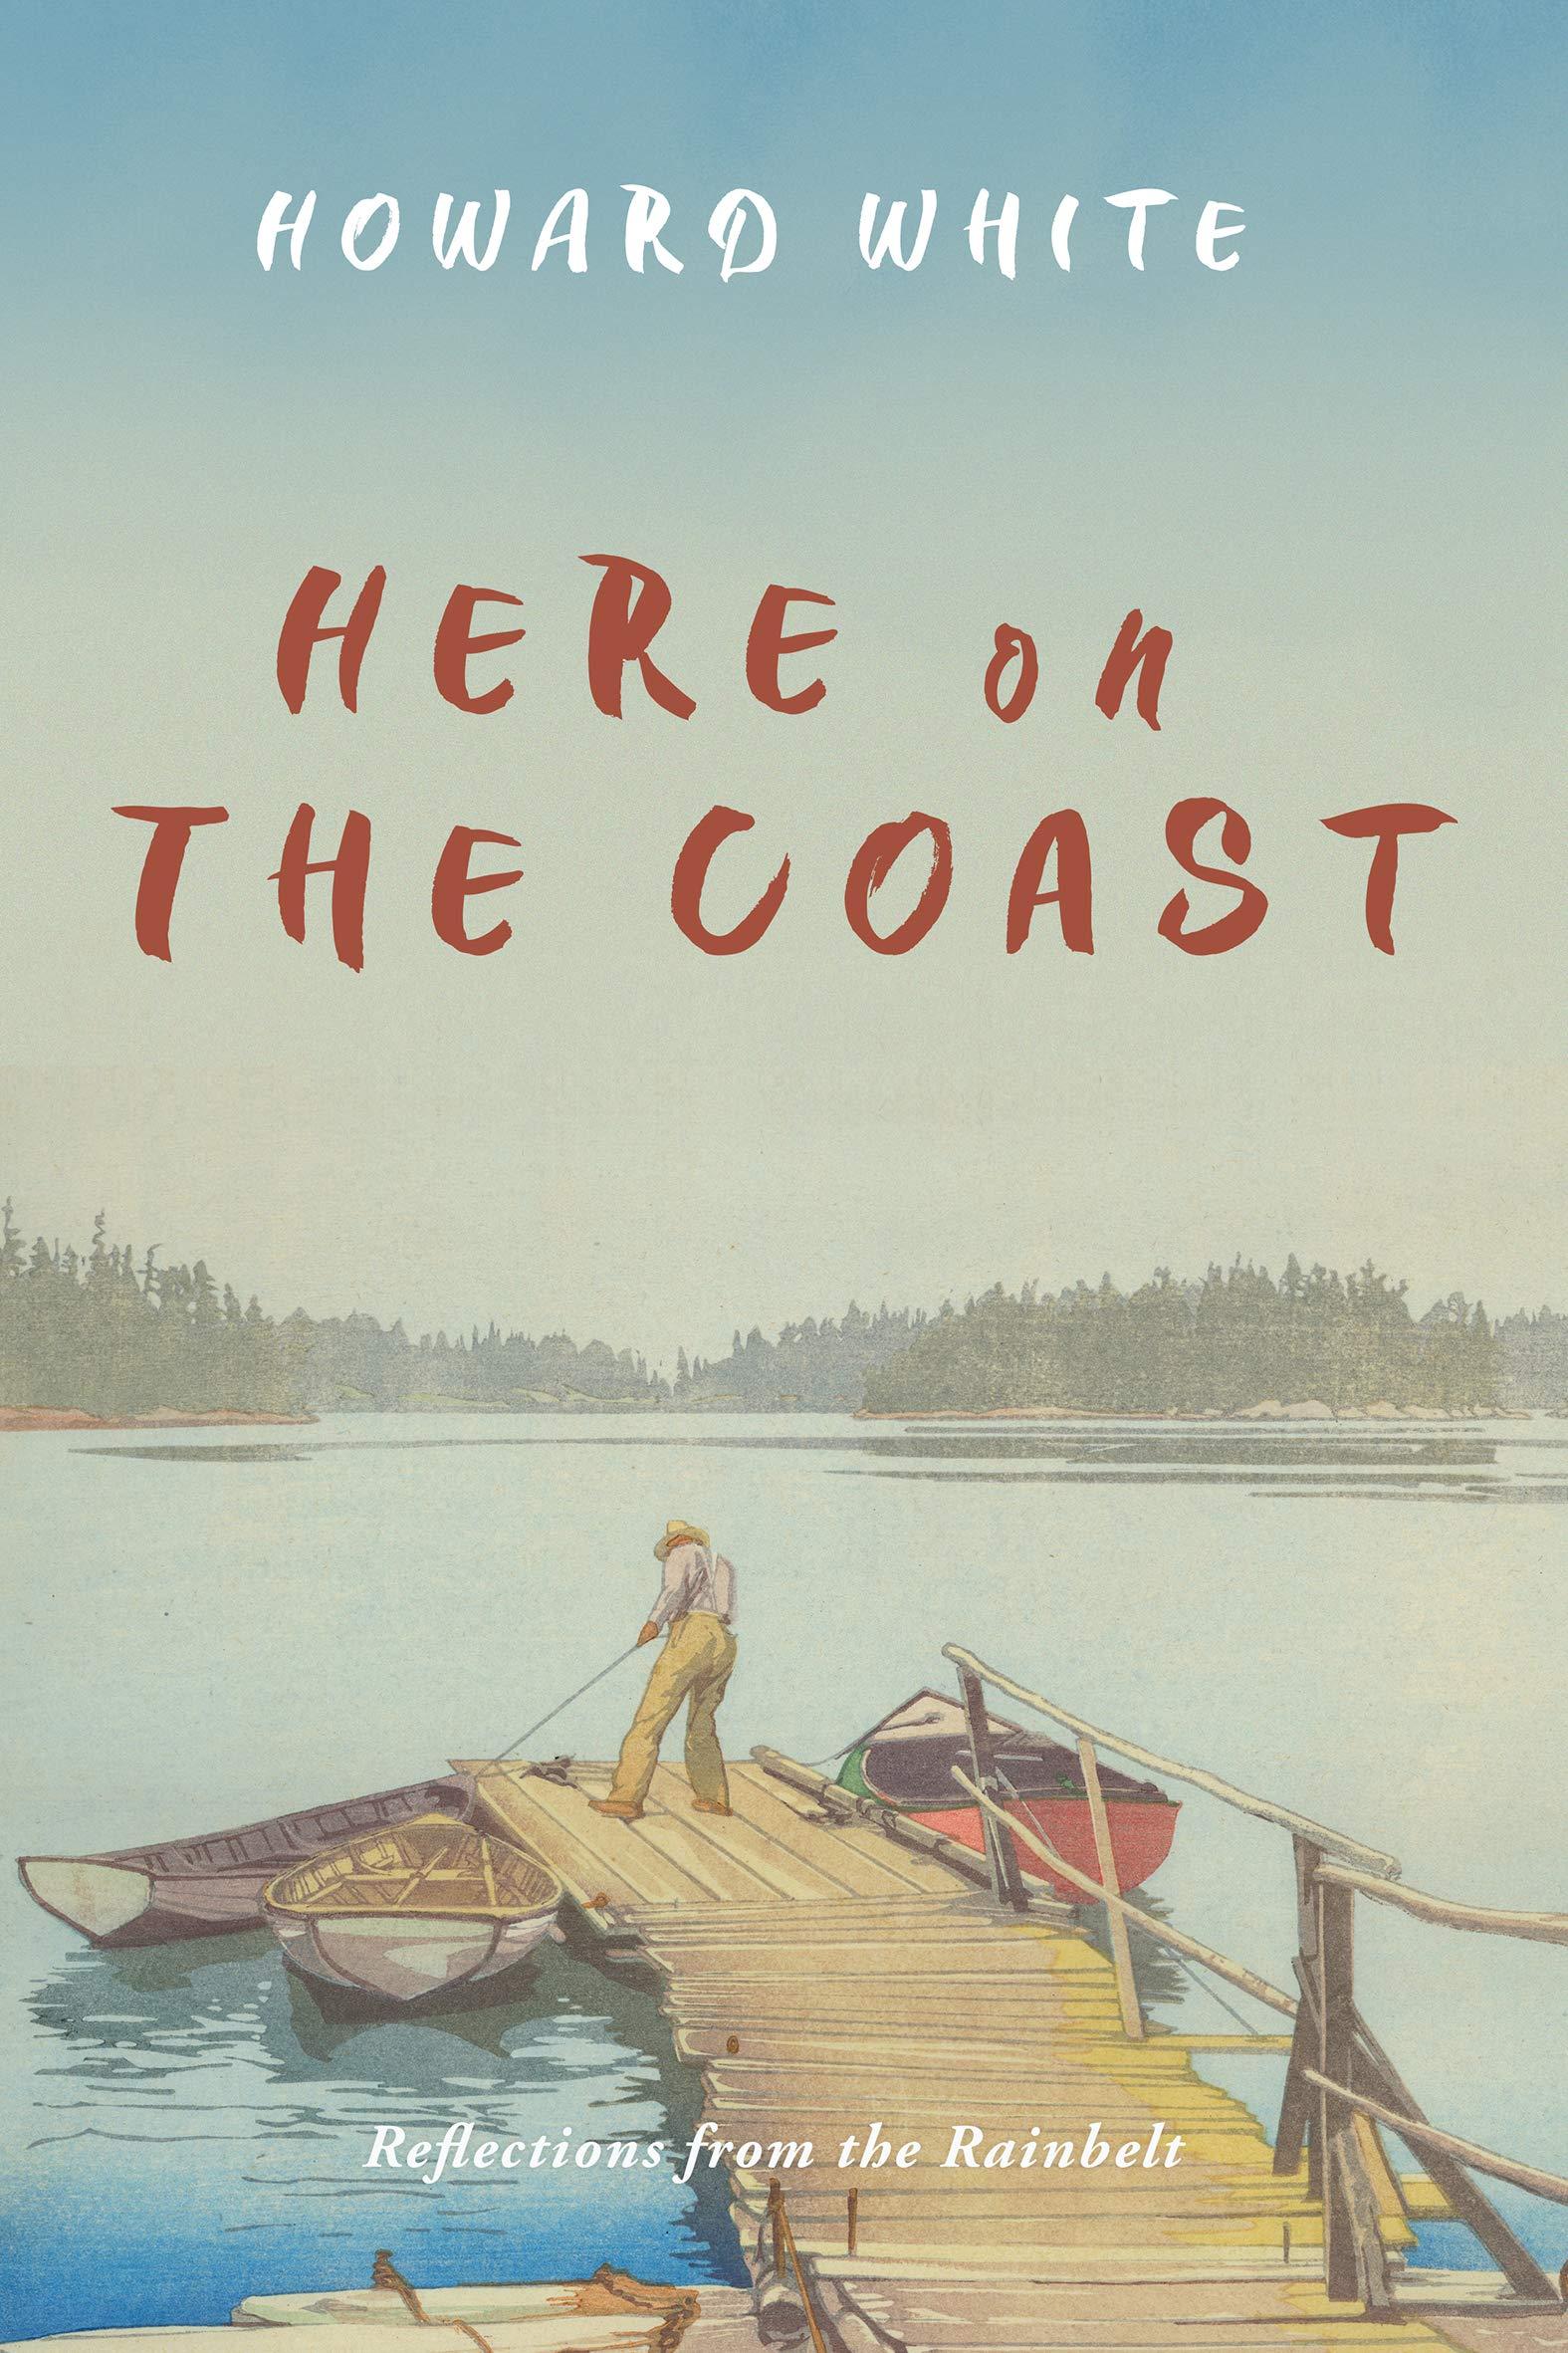 Here on the Coast: Reflections from the Rainbelt: White, Howard: 9781550179248: Books - Amazon.ca